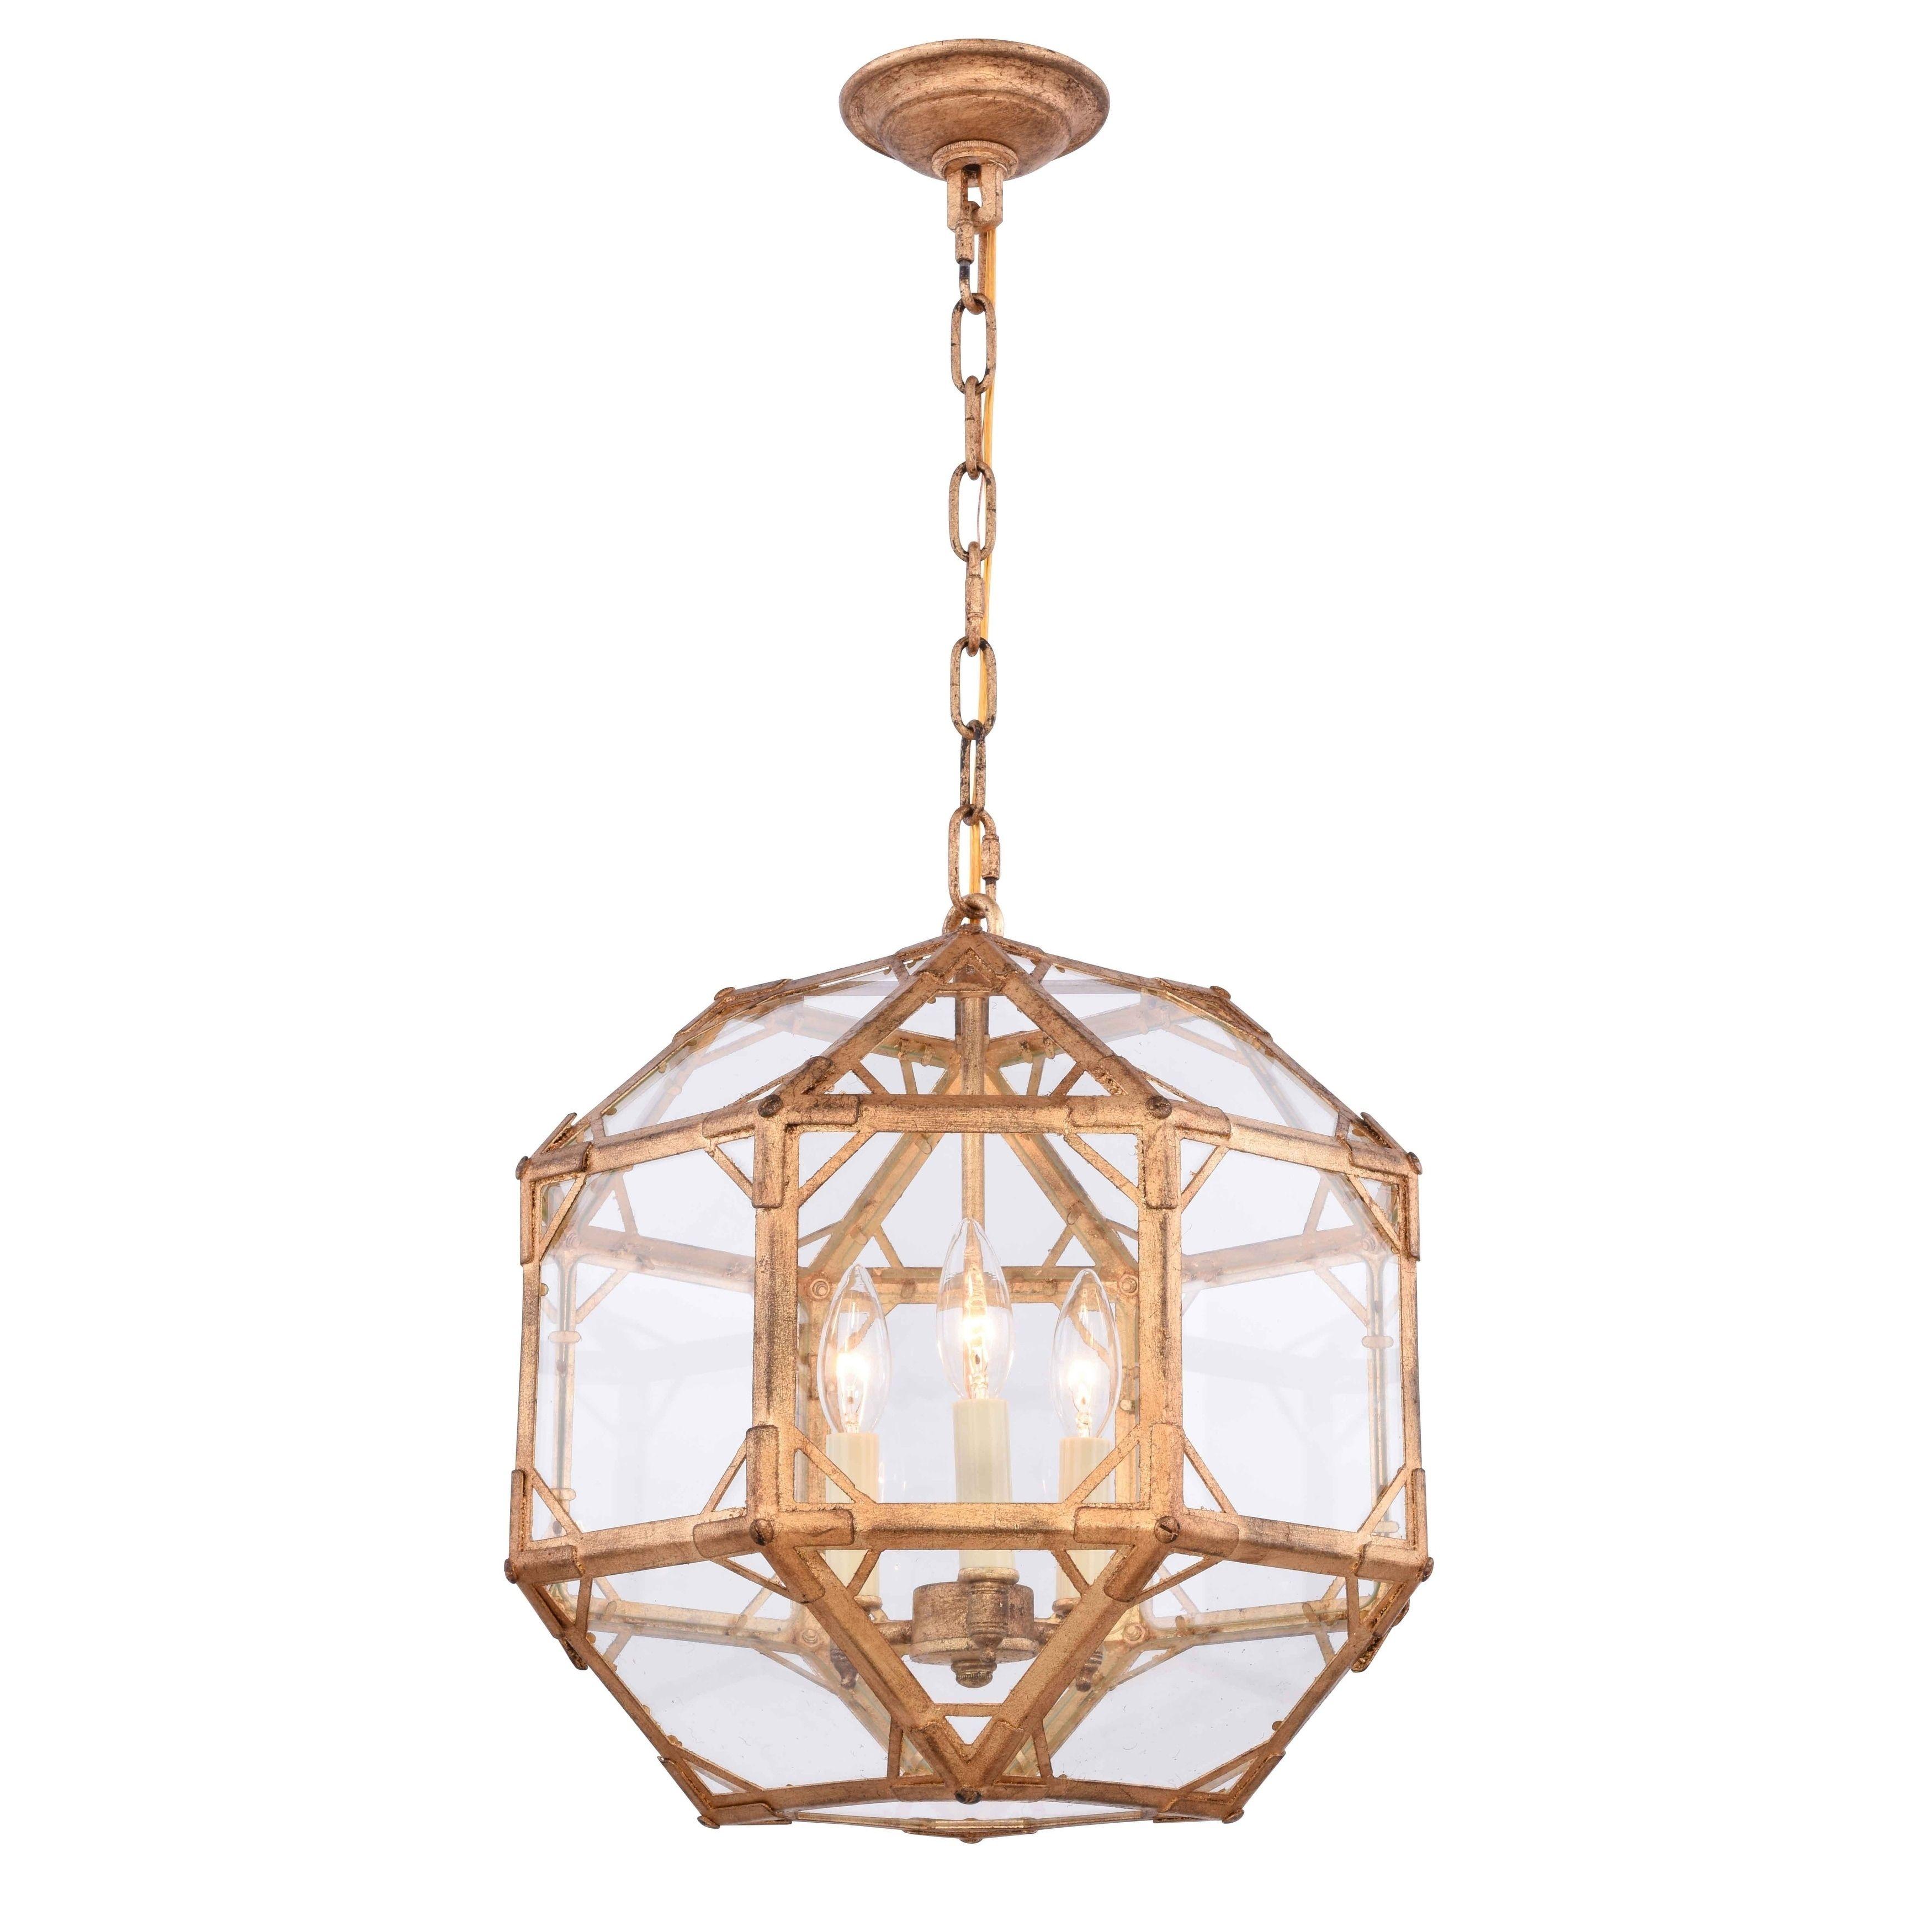 Royce edge light pendant golden iron polished nickel rustic